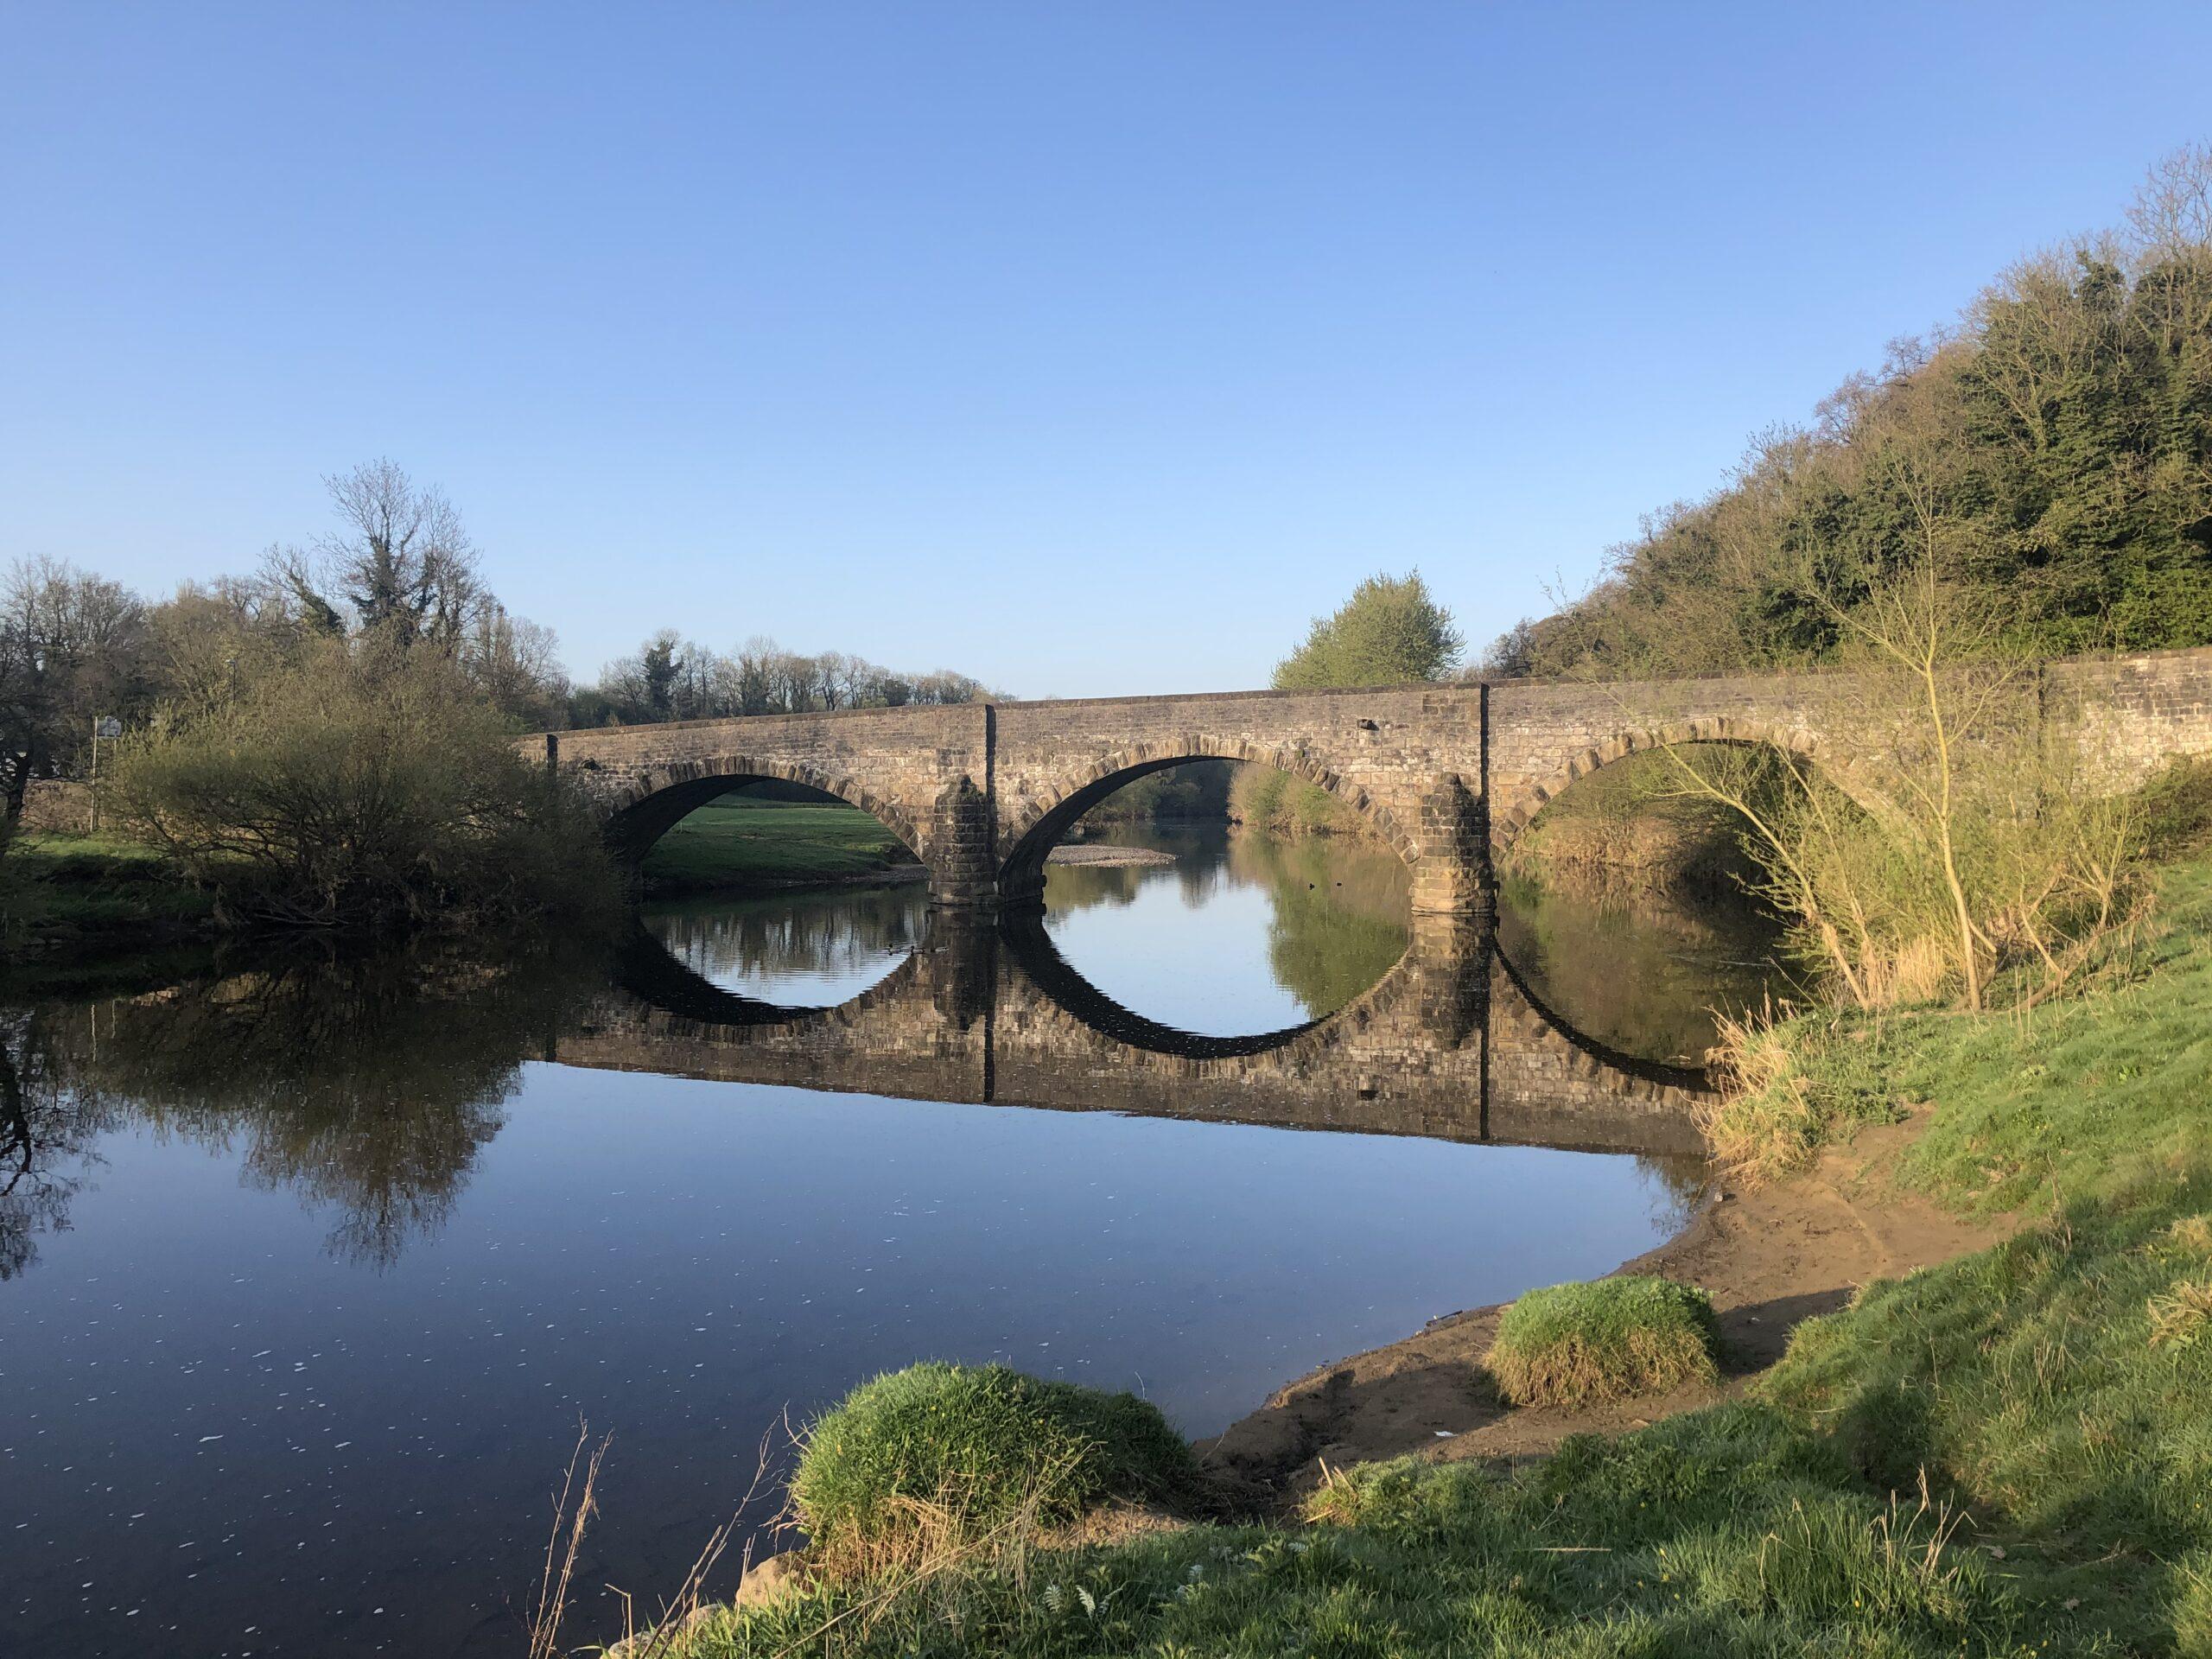 River Ribble - Brungerly Bridge - Clitheroe